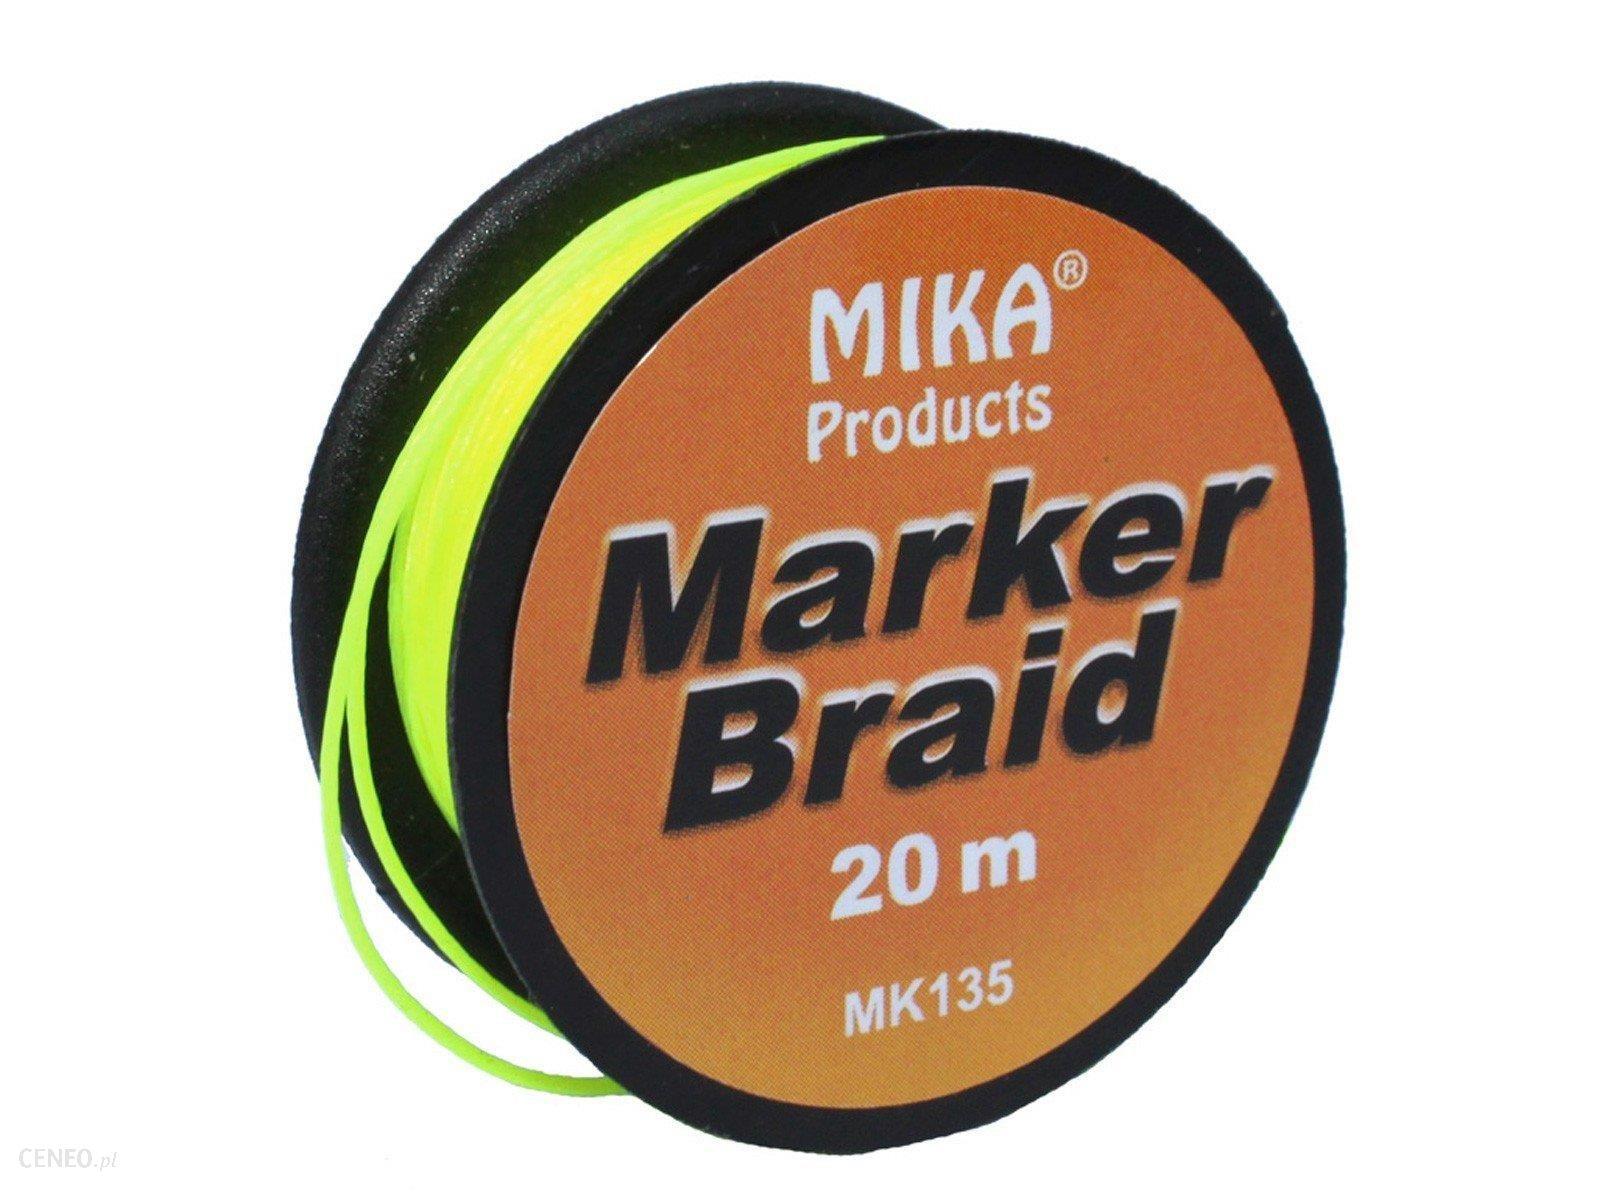 Mika Products Marker Braid 20 M Żółty